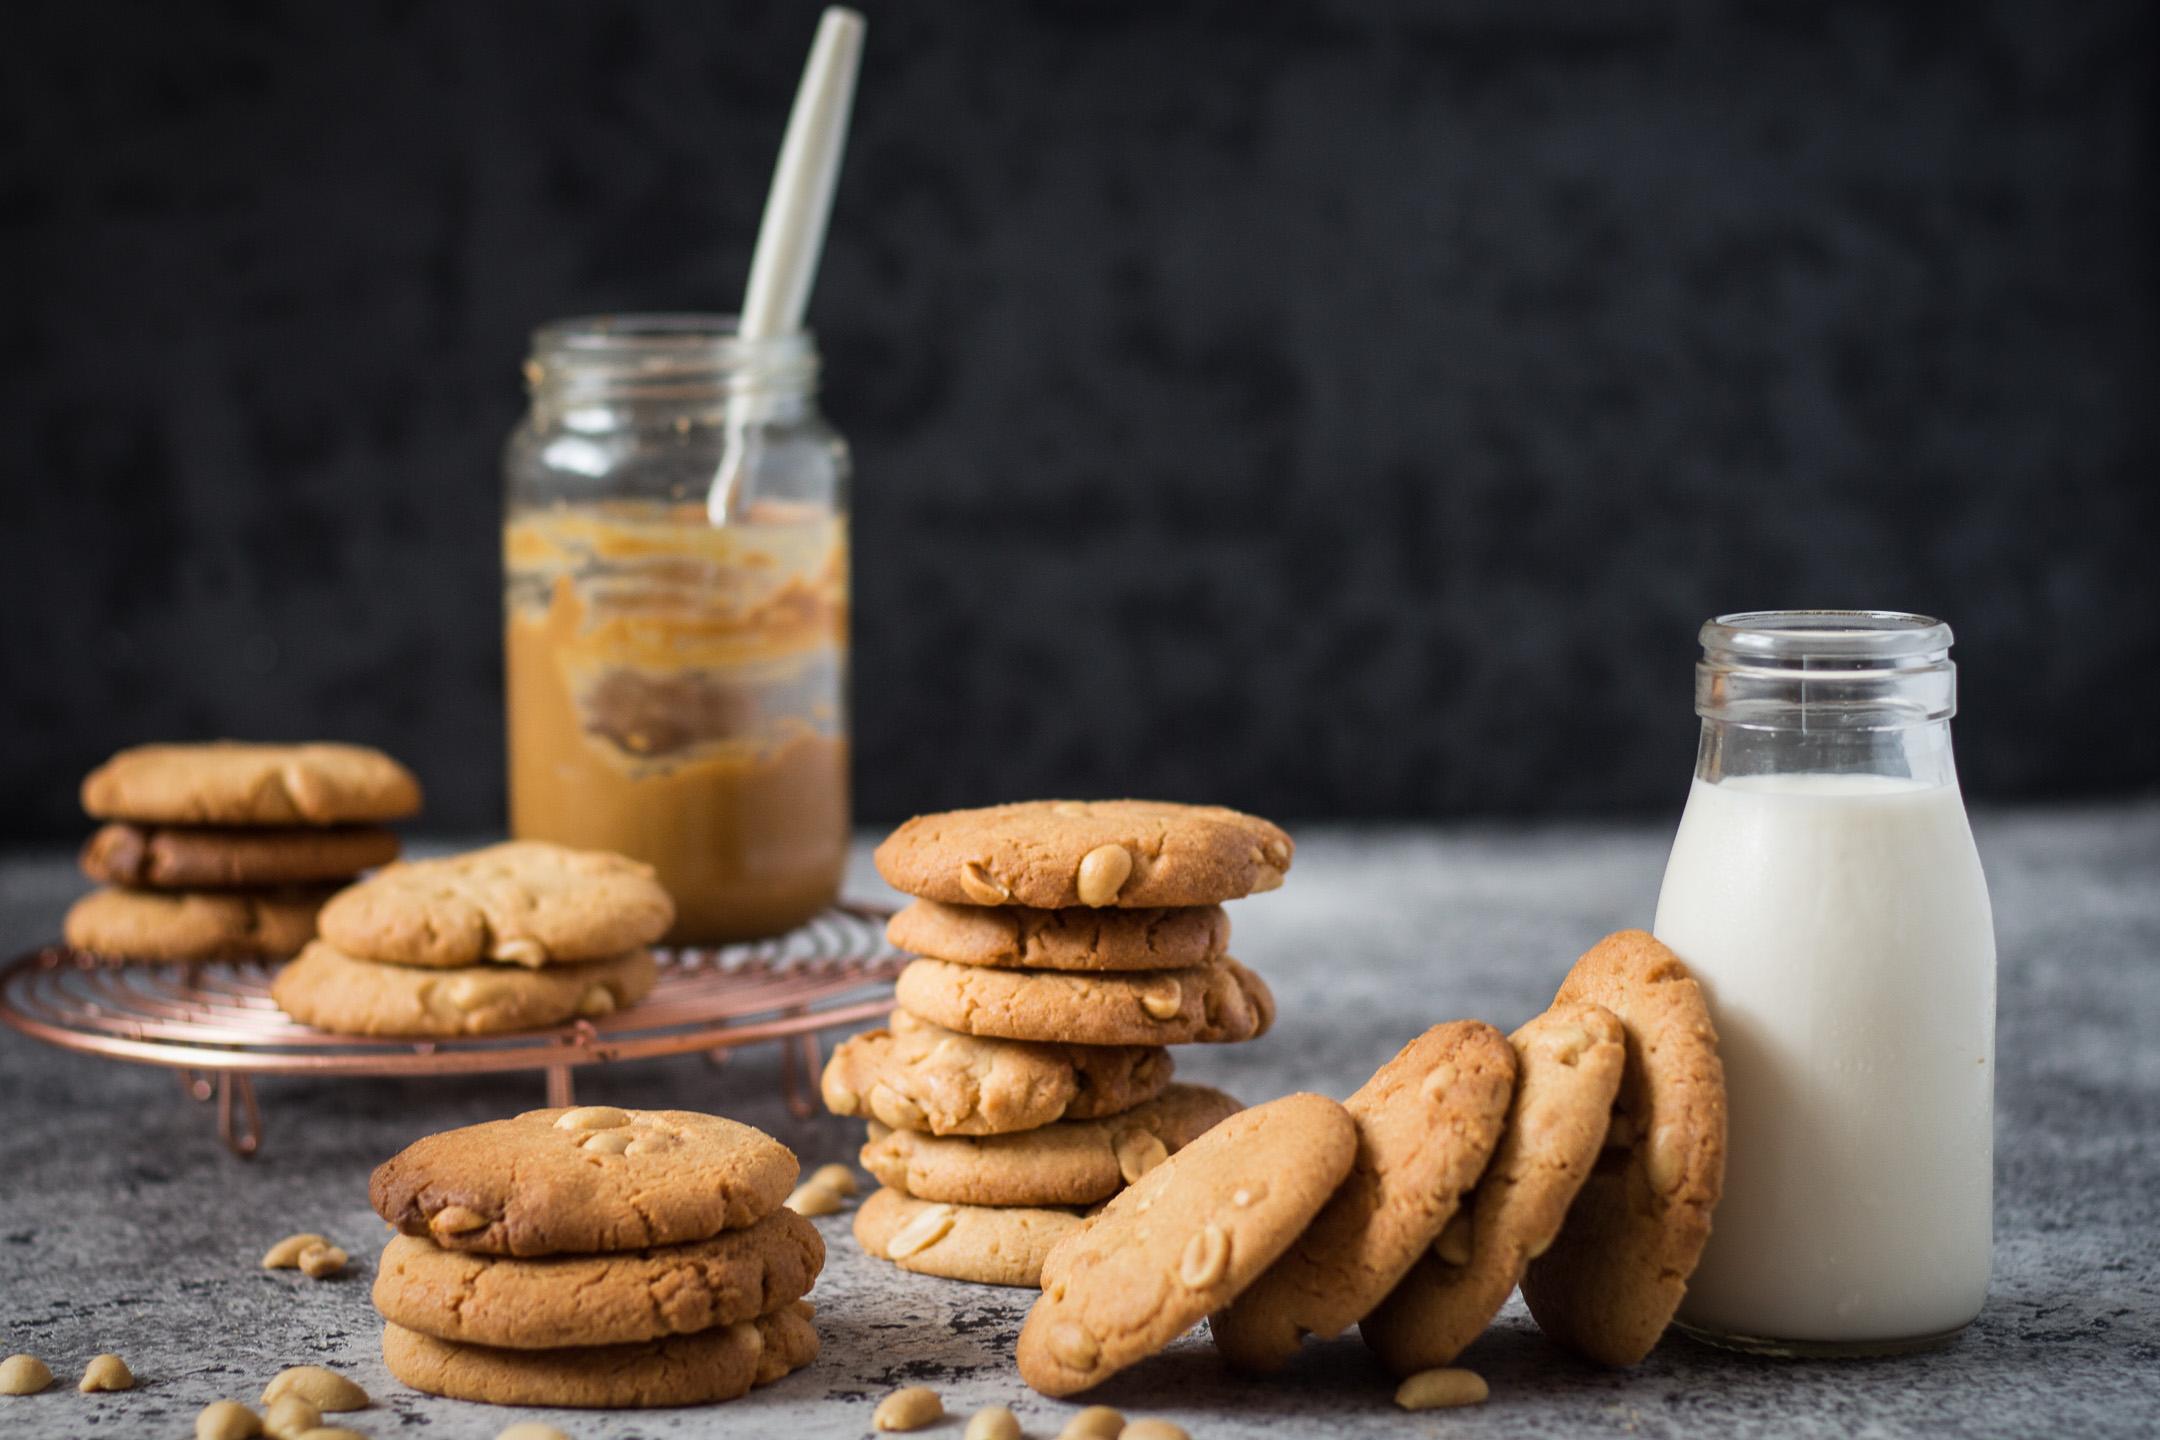 salted-peanut-butter-cookie-gluten-free-recipe-5